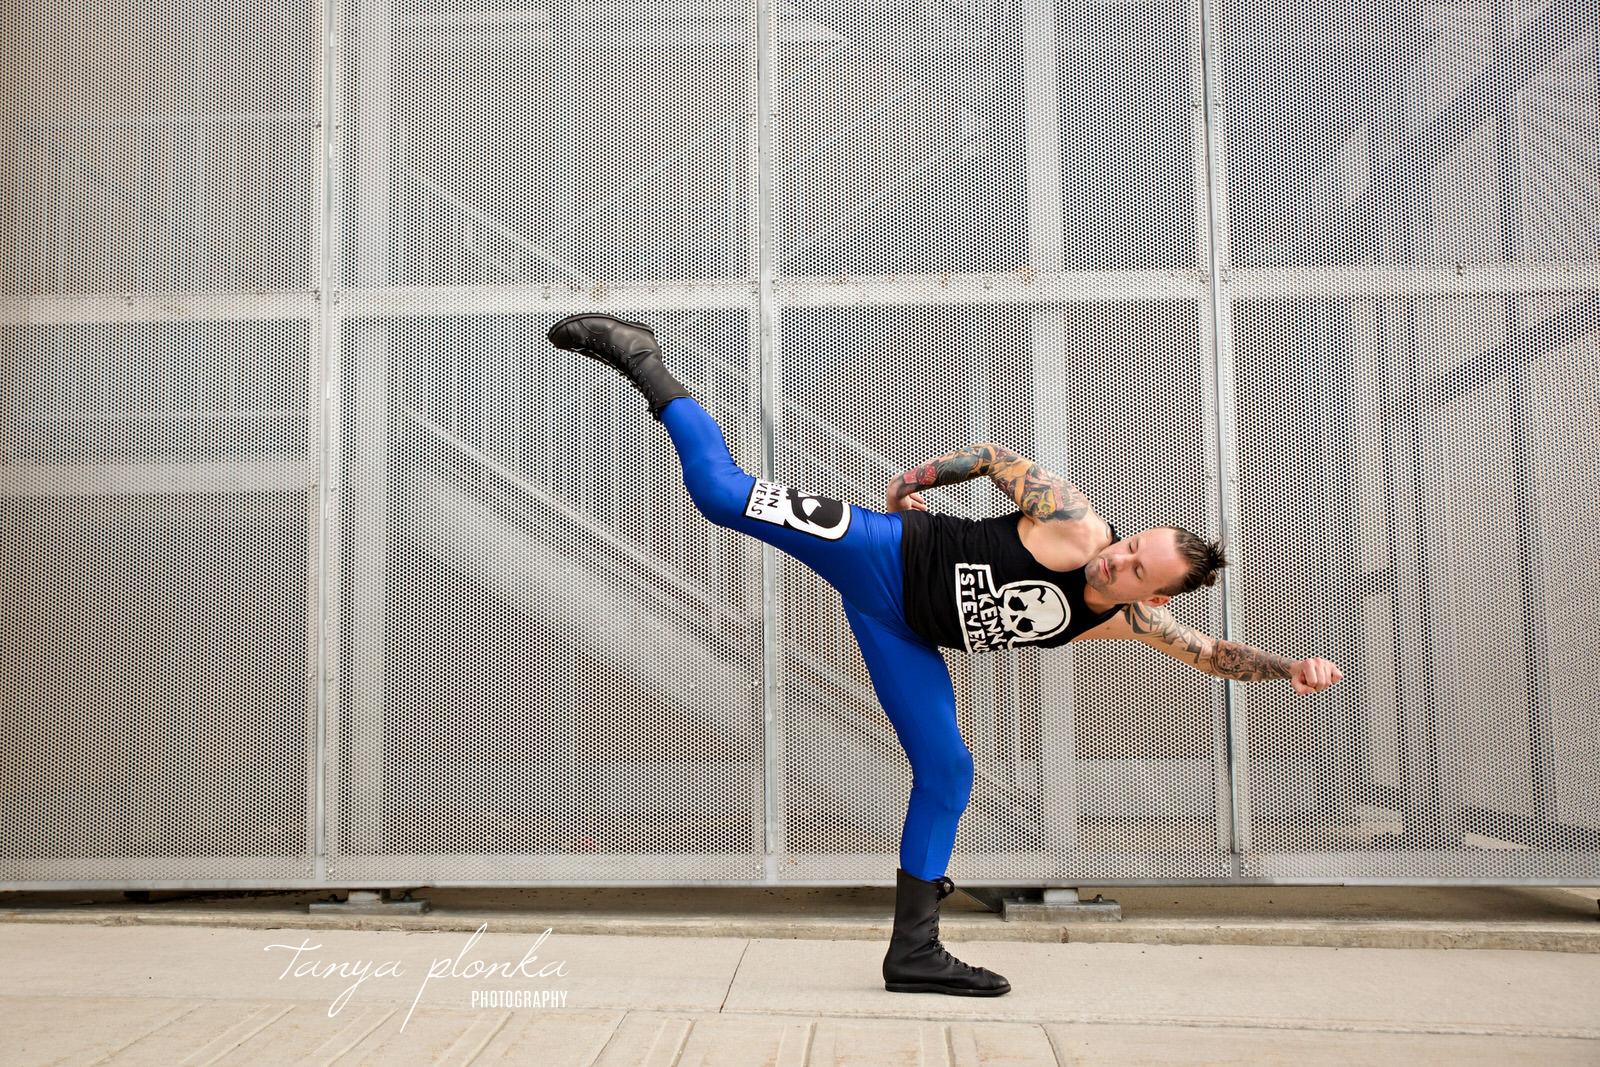 Wrestler kicks high in air